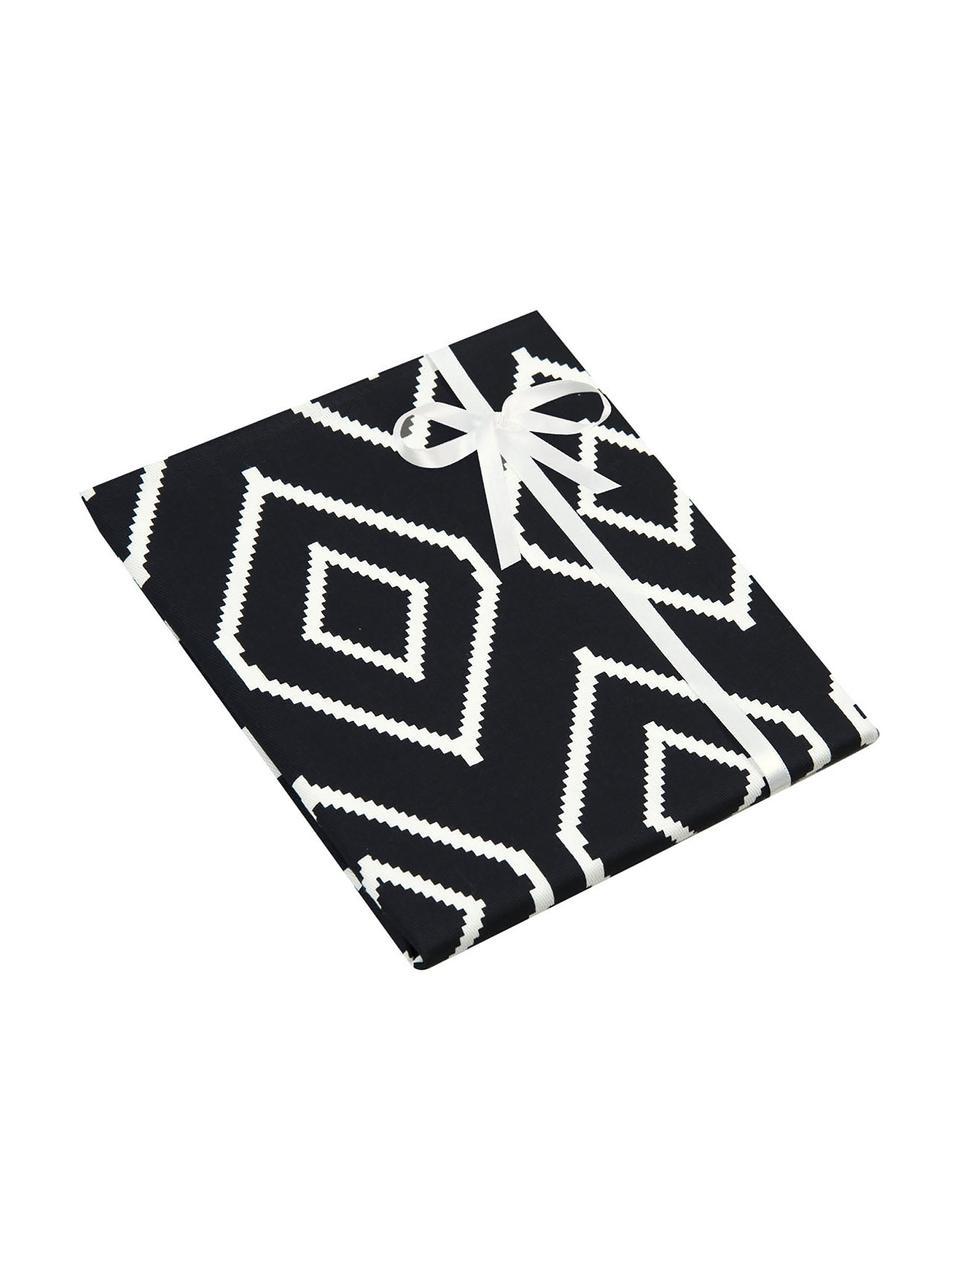 Federa arredo color nero/bianco Gracie, 100% cotone, tessuto panama, Nero, crema, Larg. 40 x Lung. 40 cm